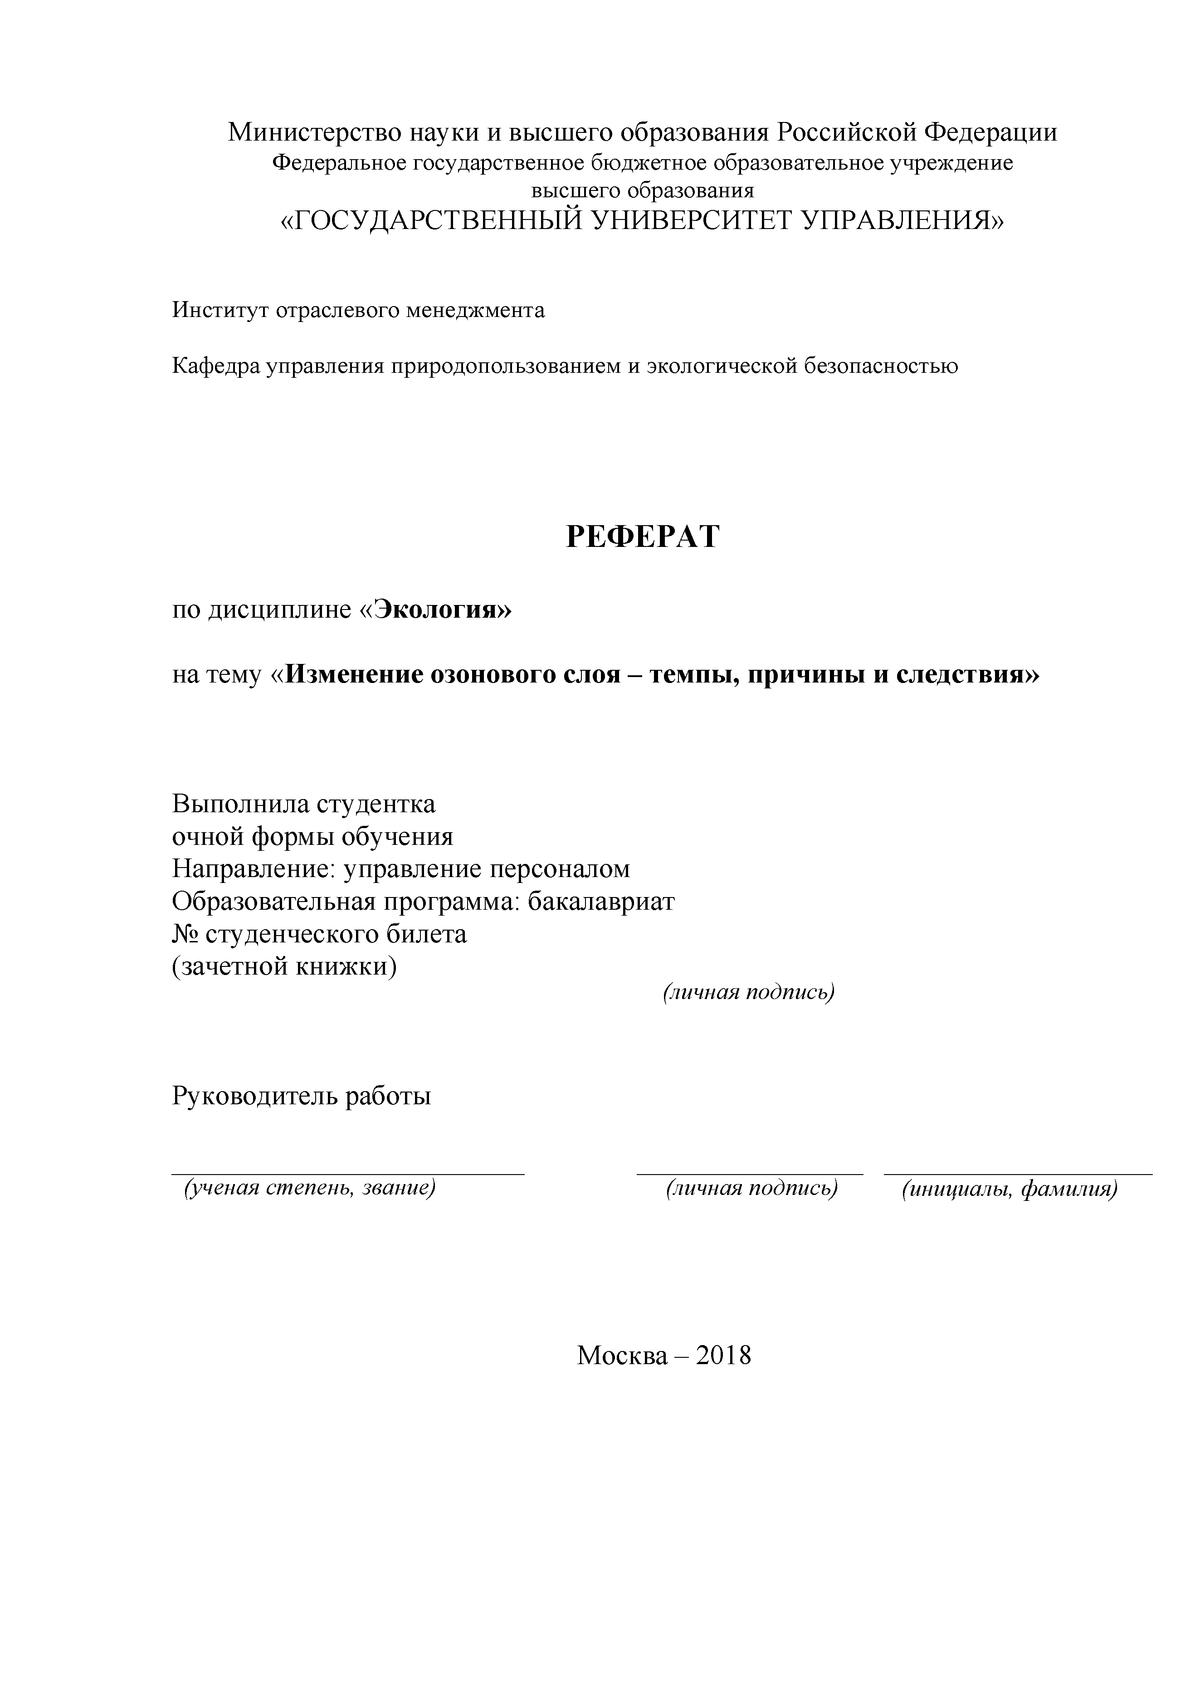 Реферат по бжд радиация 8881